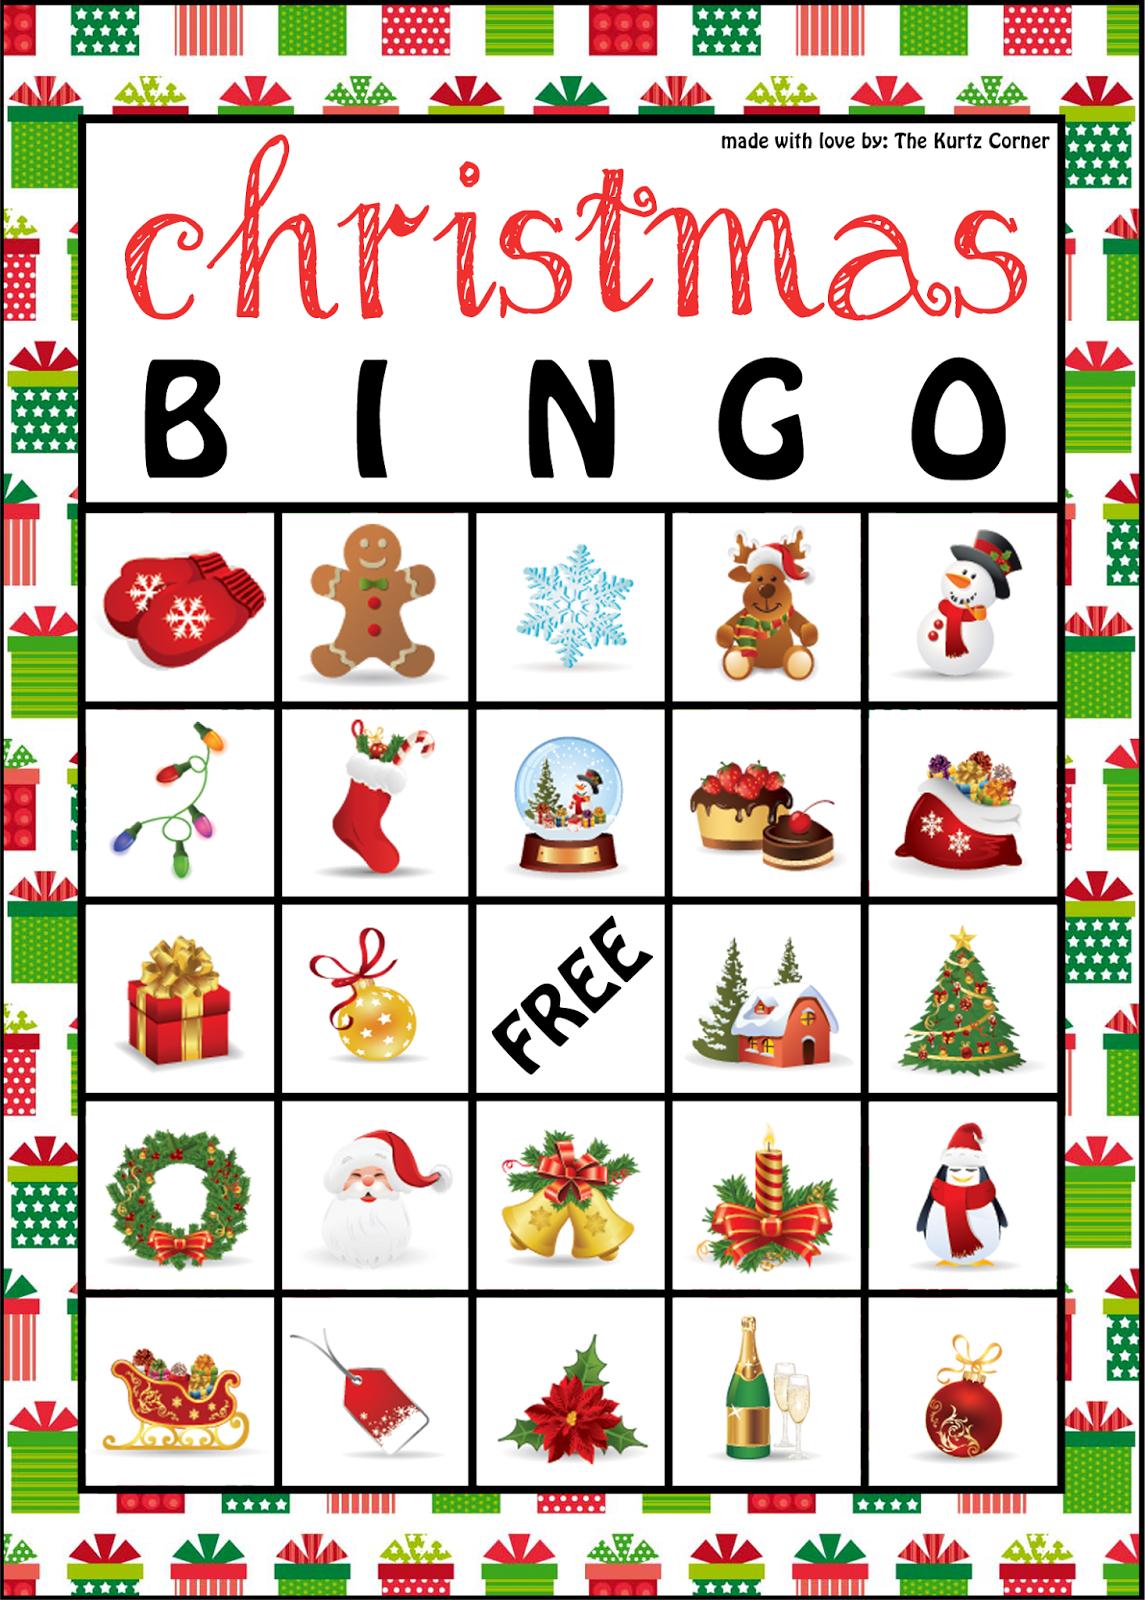 The Kurtz Corner: Free Printable Christmas Bingo Cards | Winter / X - Free Christmas Bingo Game Printable